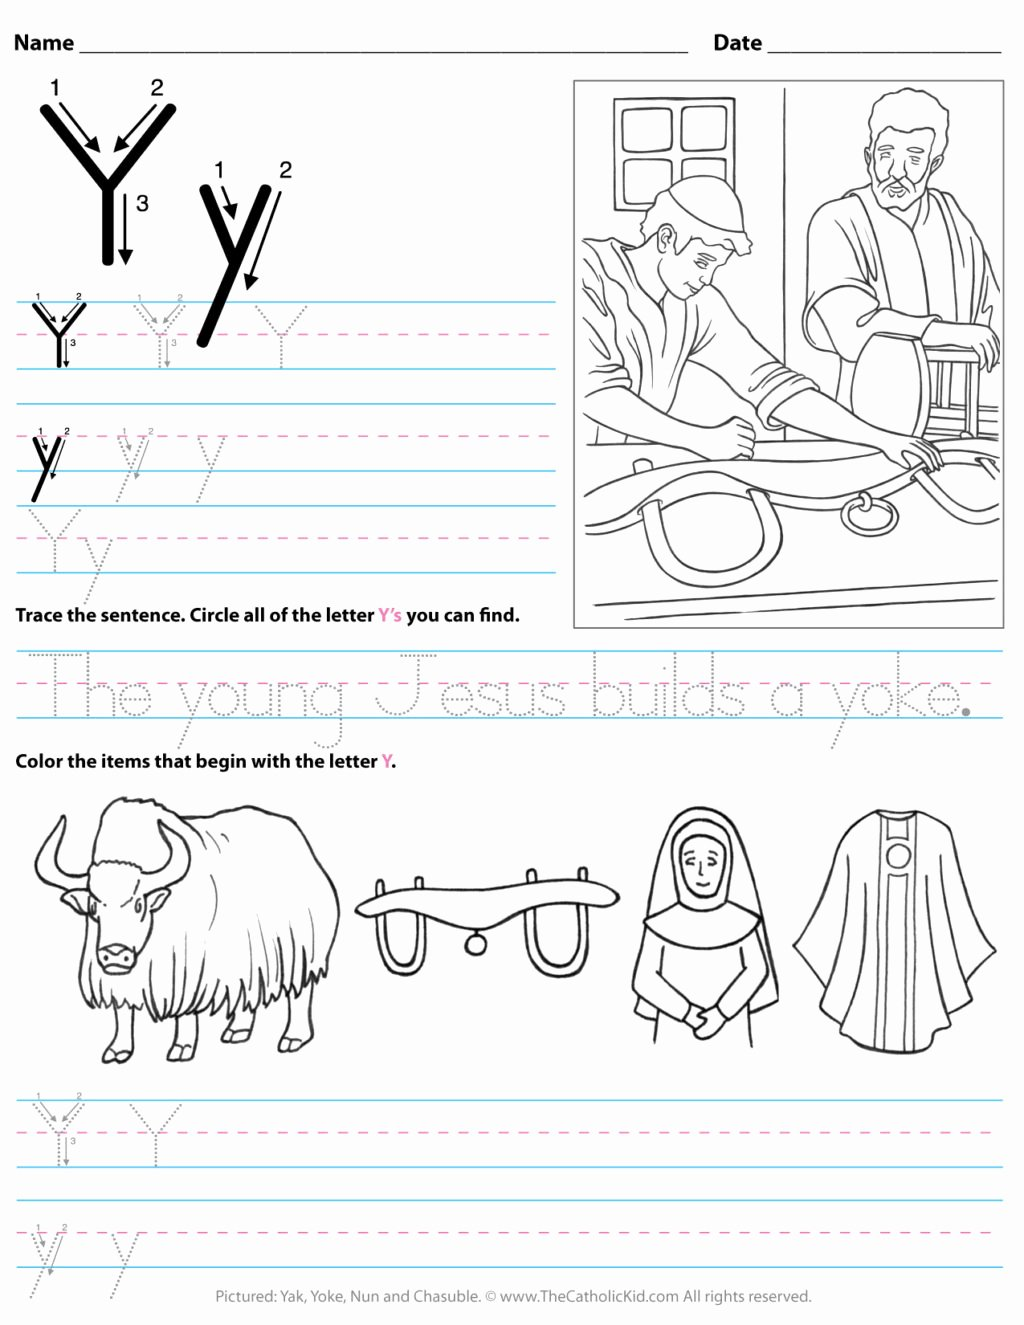 Letter Y Worksheets for Preschoolers Ideas Worksheet Marvelous Alphabet Worksheets for Preschoolers